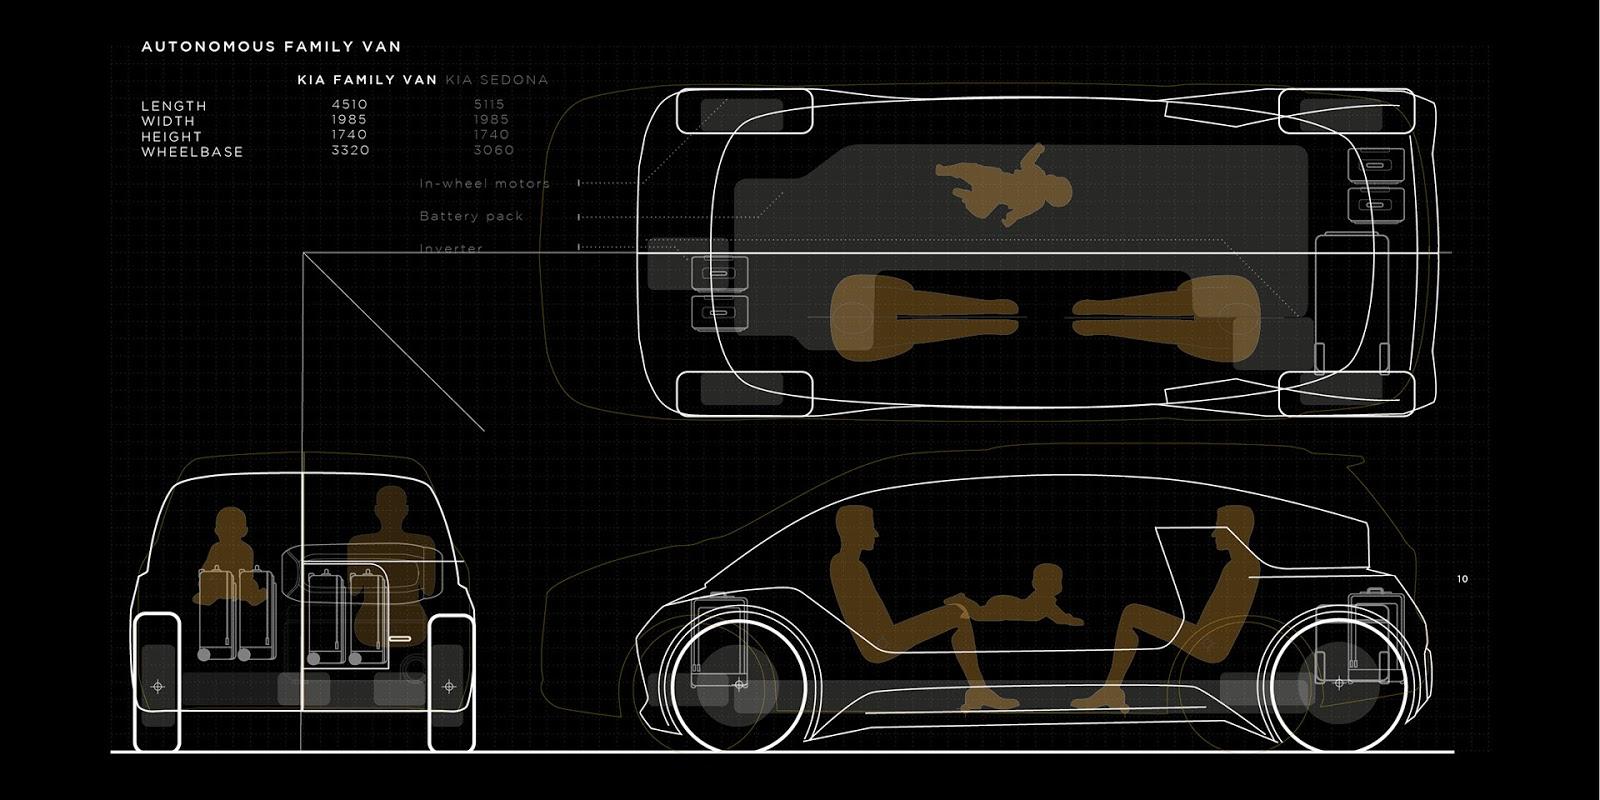 kia-autonomous-van-concept-5.jpg